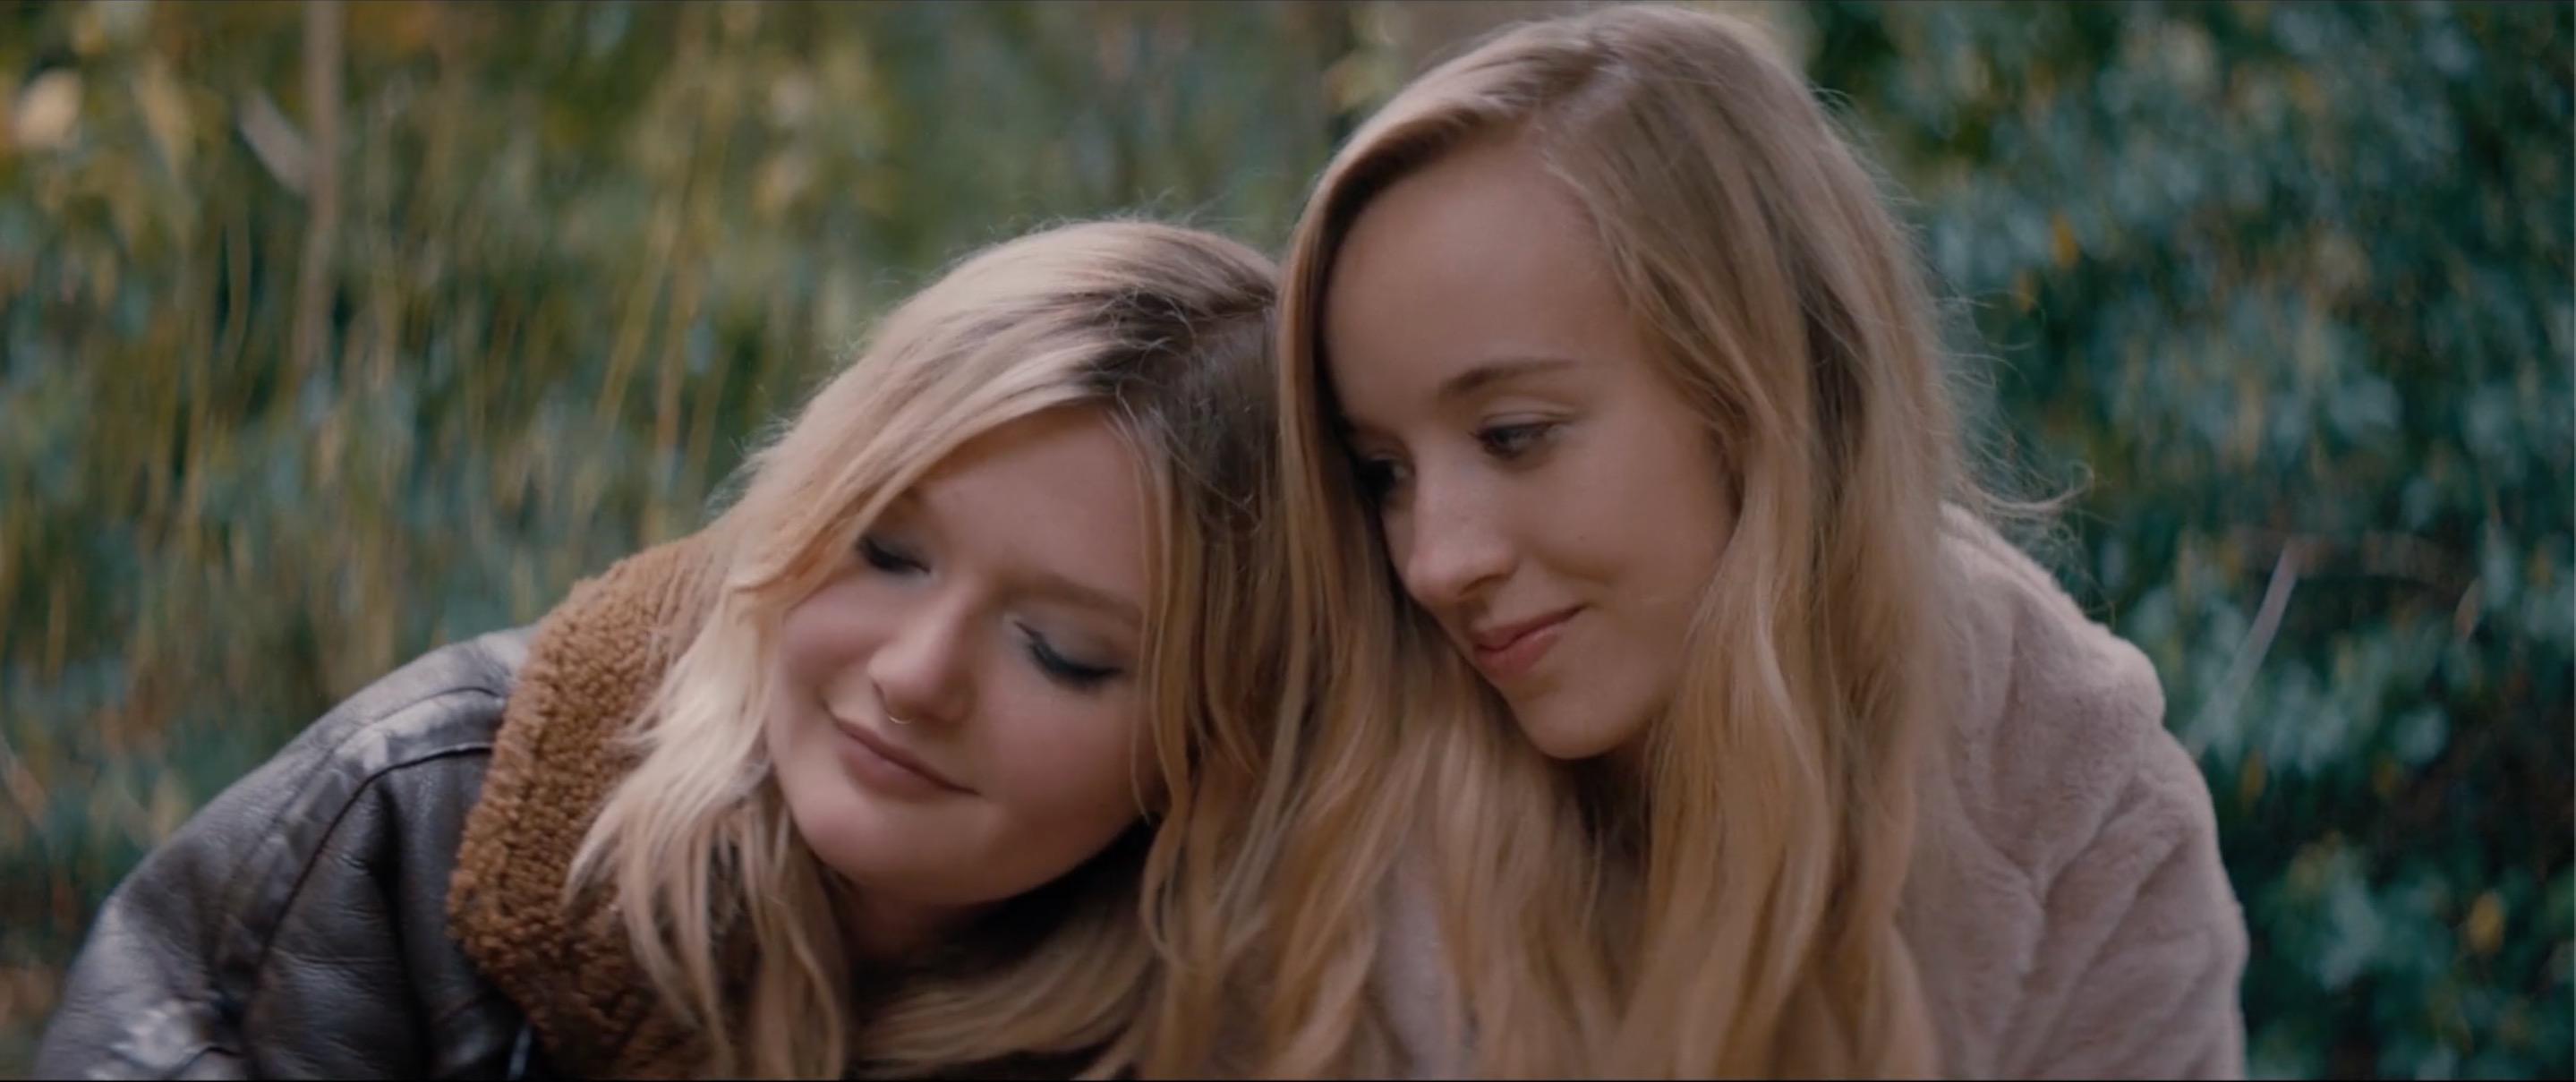 Sorority - Sophie Kennedy Clark and Emily Haigh